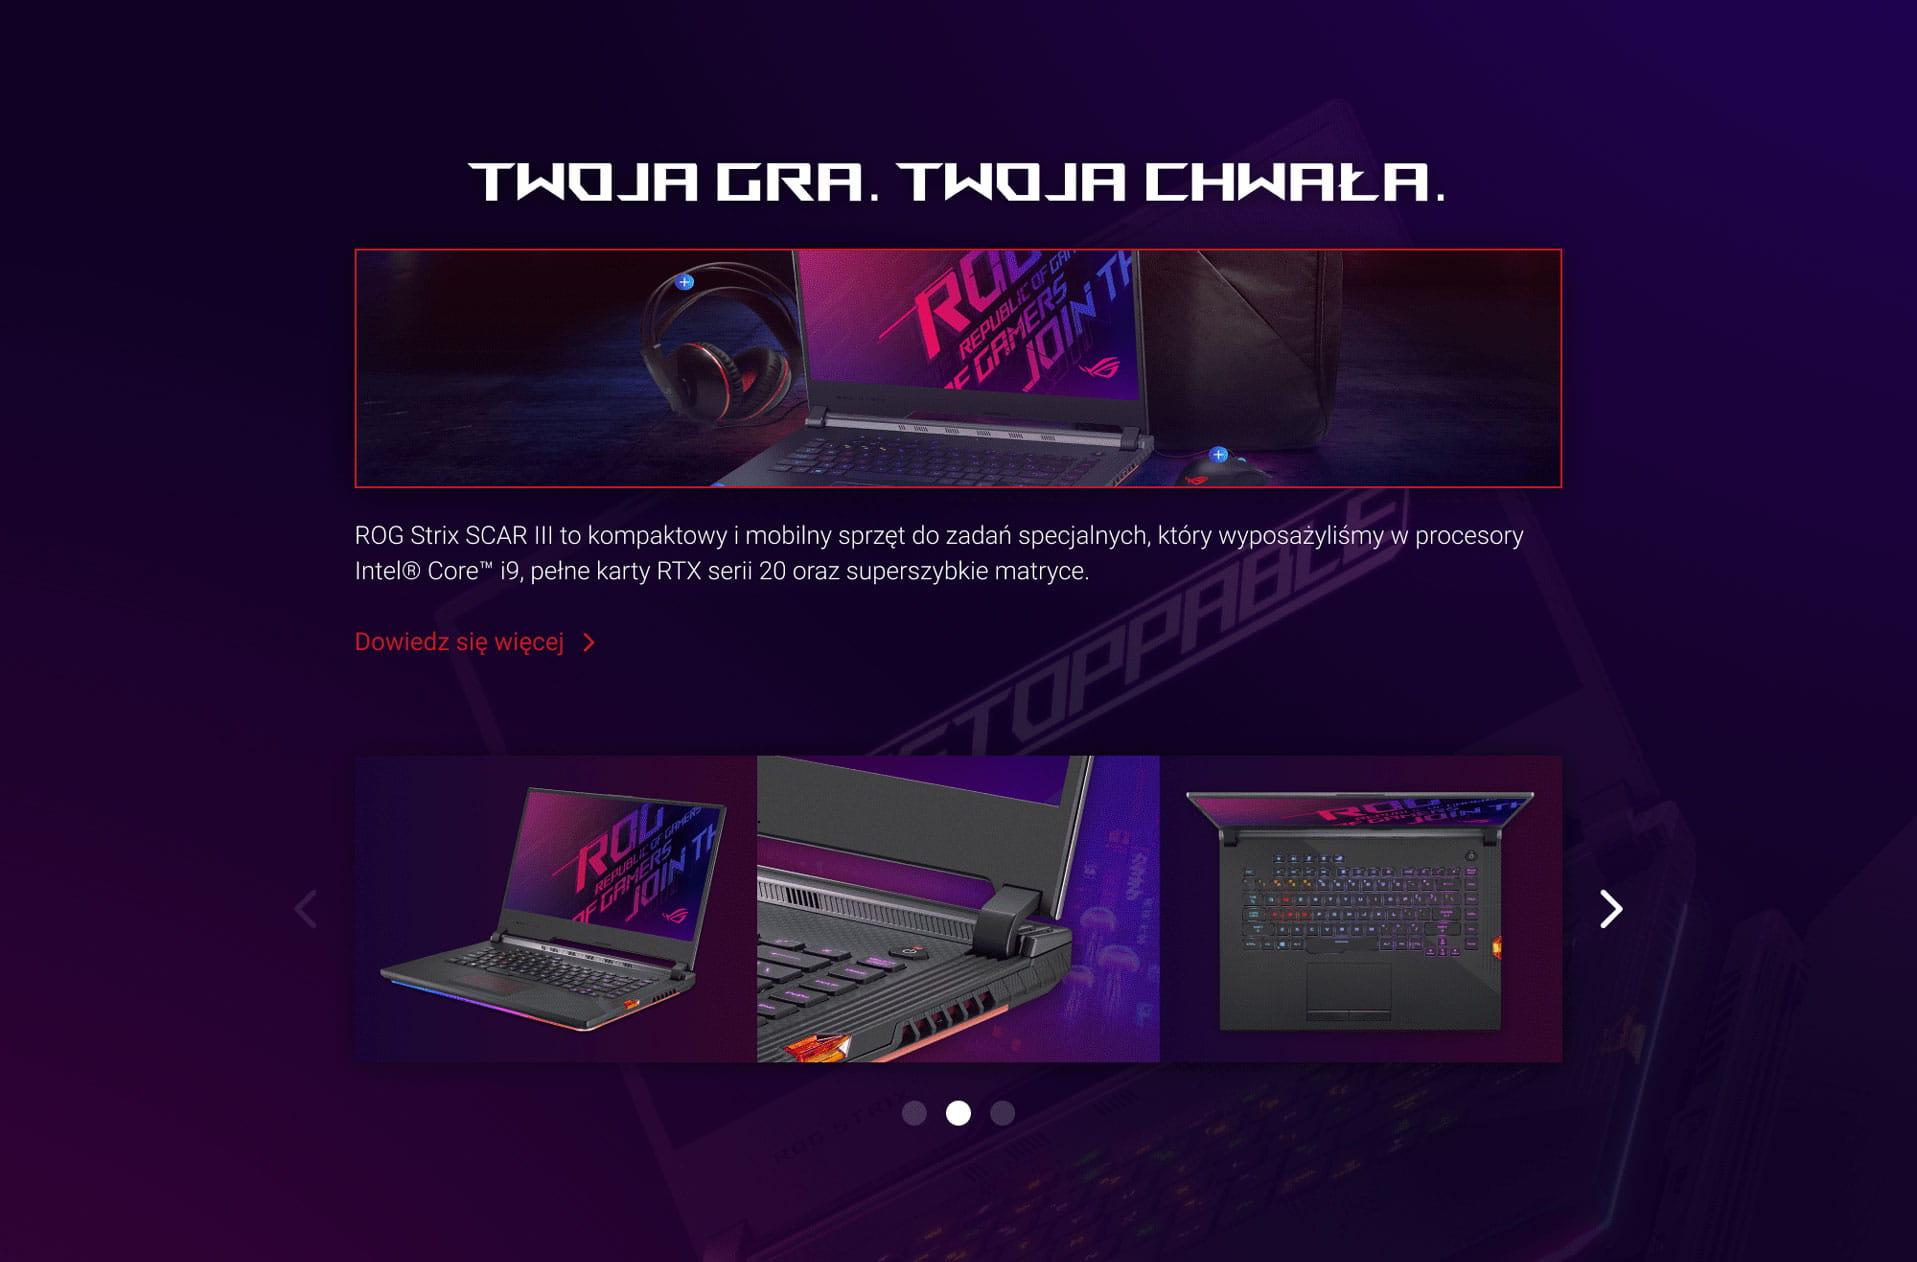 ROG Strix SCAR III Intel Core i9 RTX serii 20